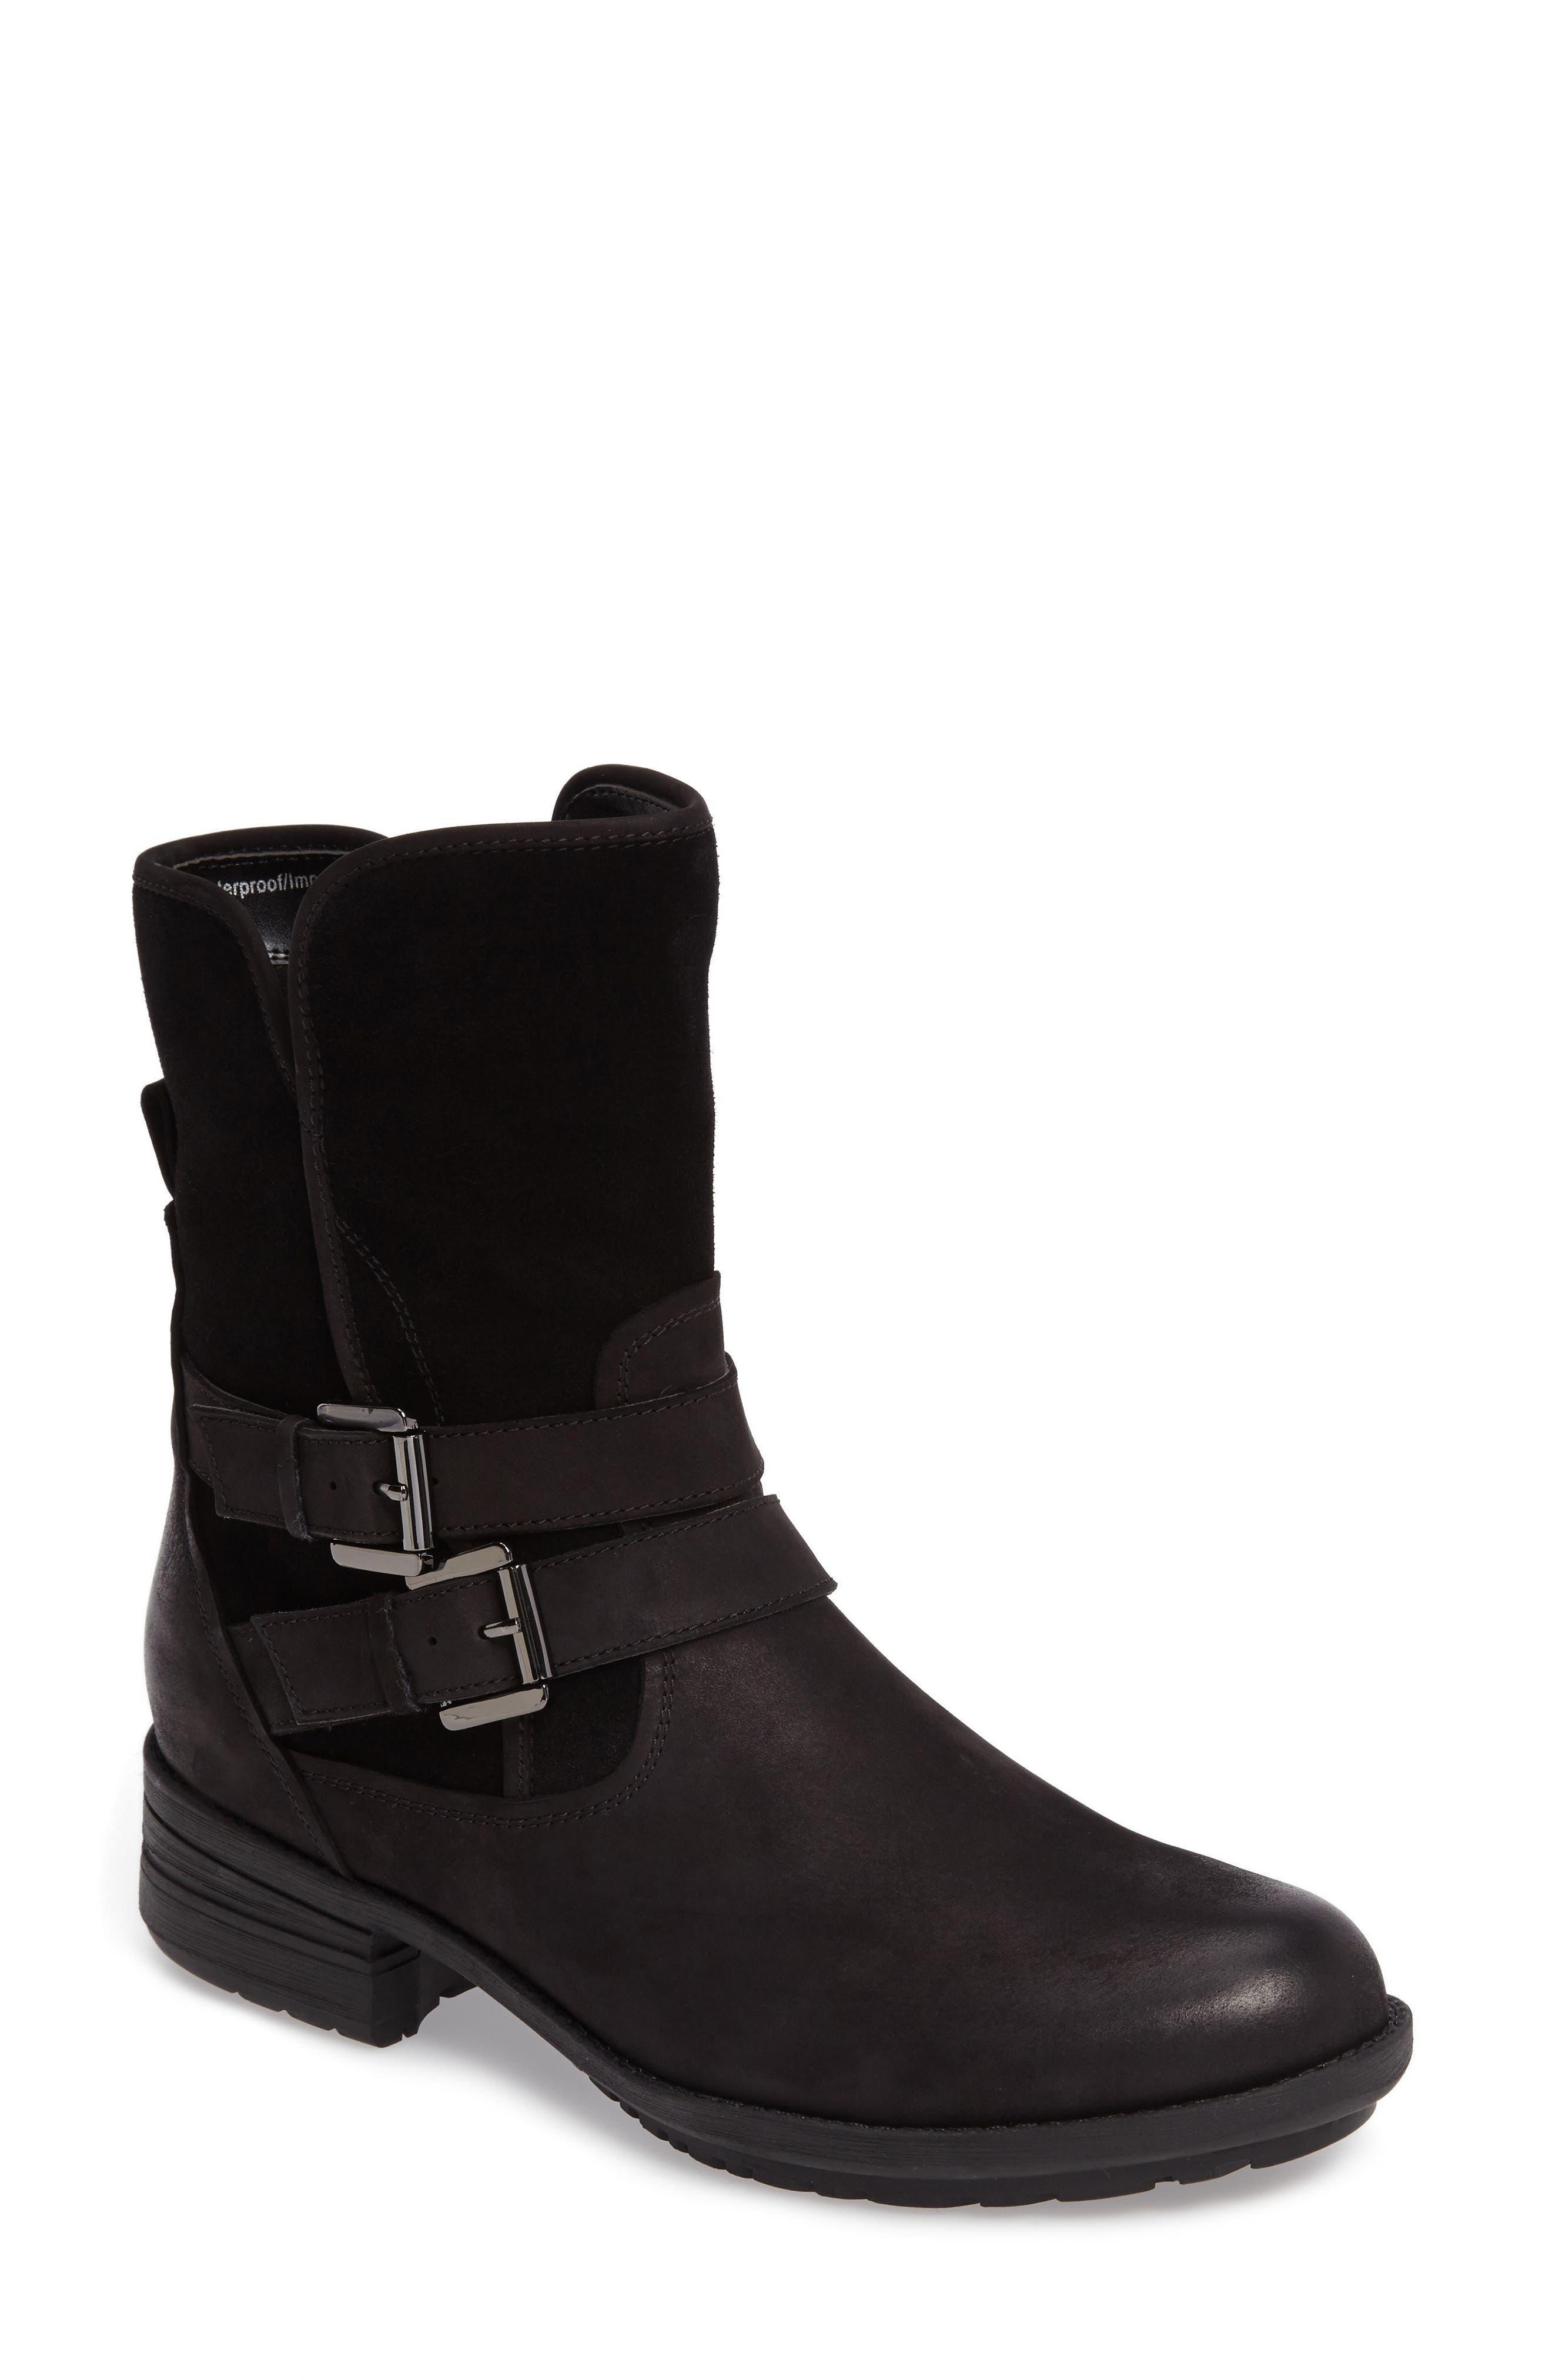 Tula Waterproof Boot,                         Main,                         color, Black Nubuck Leather